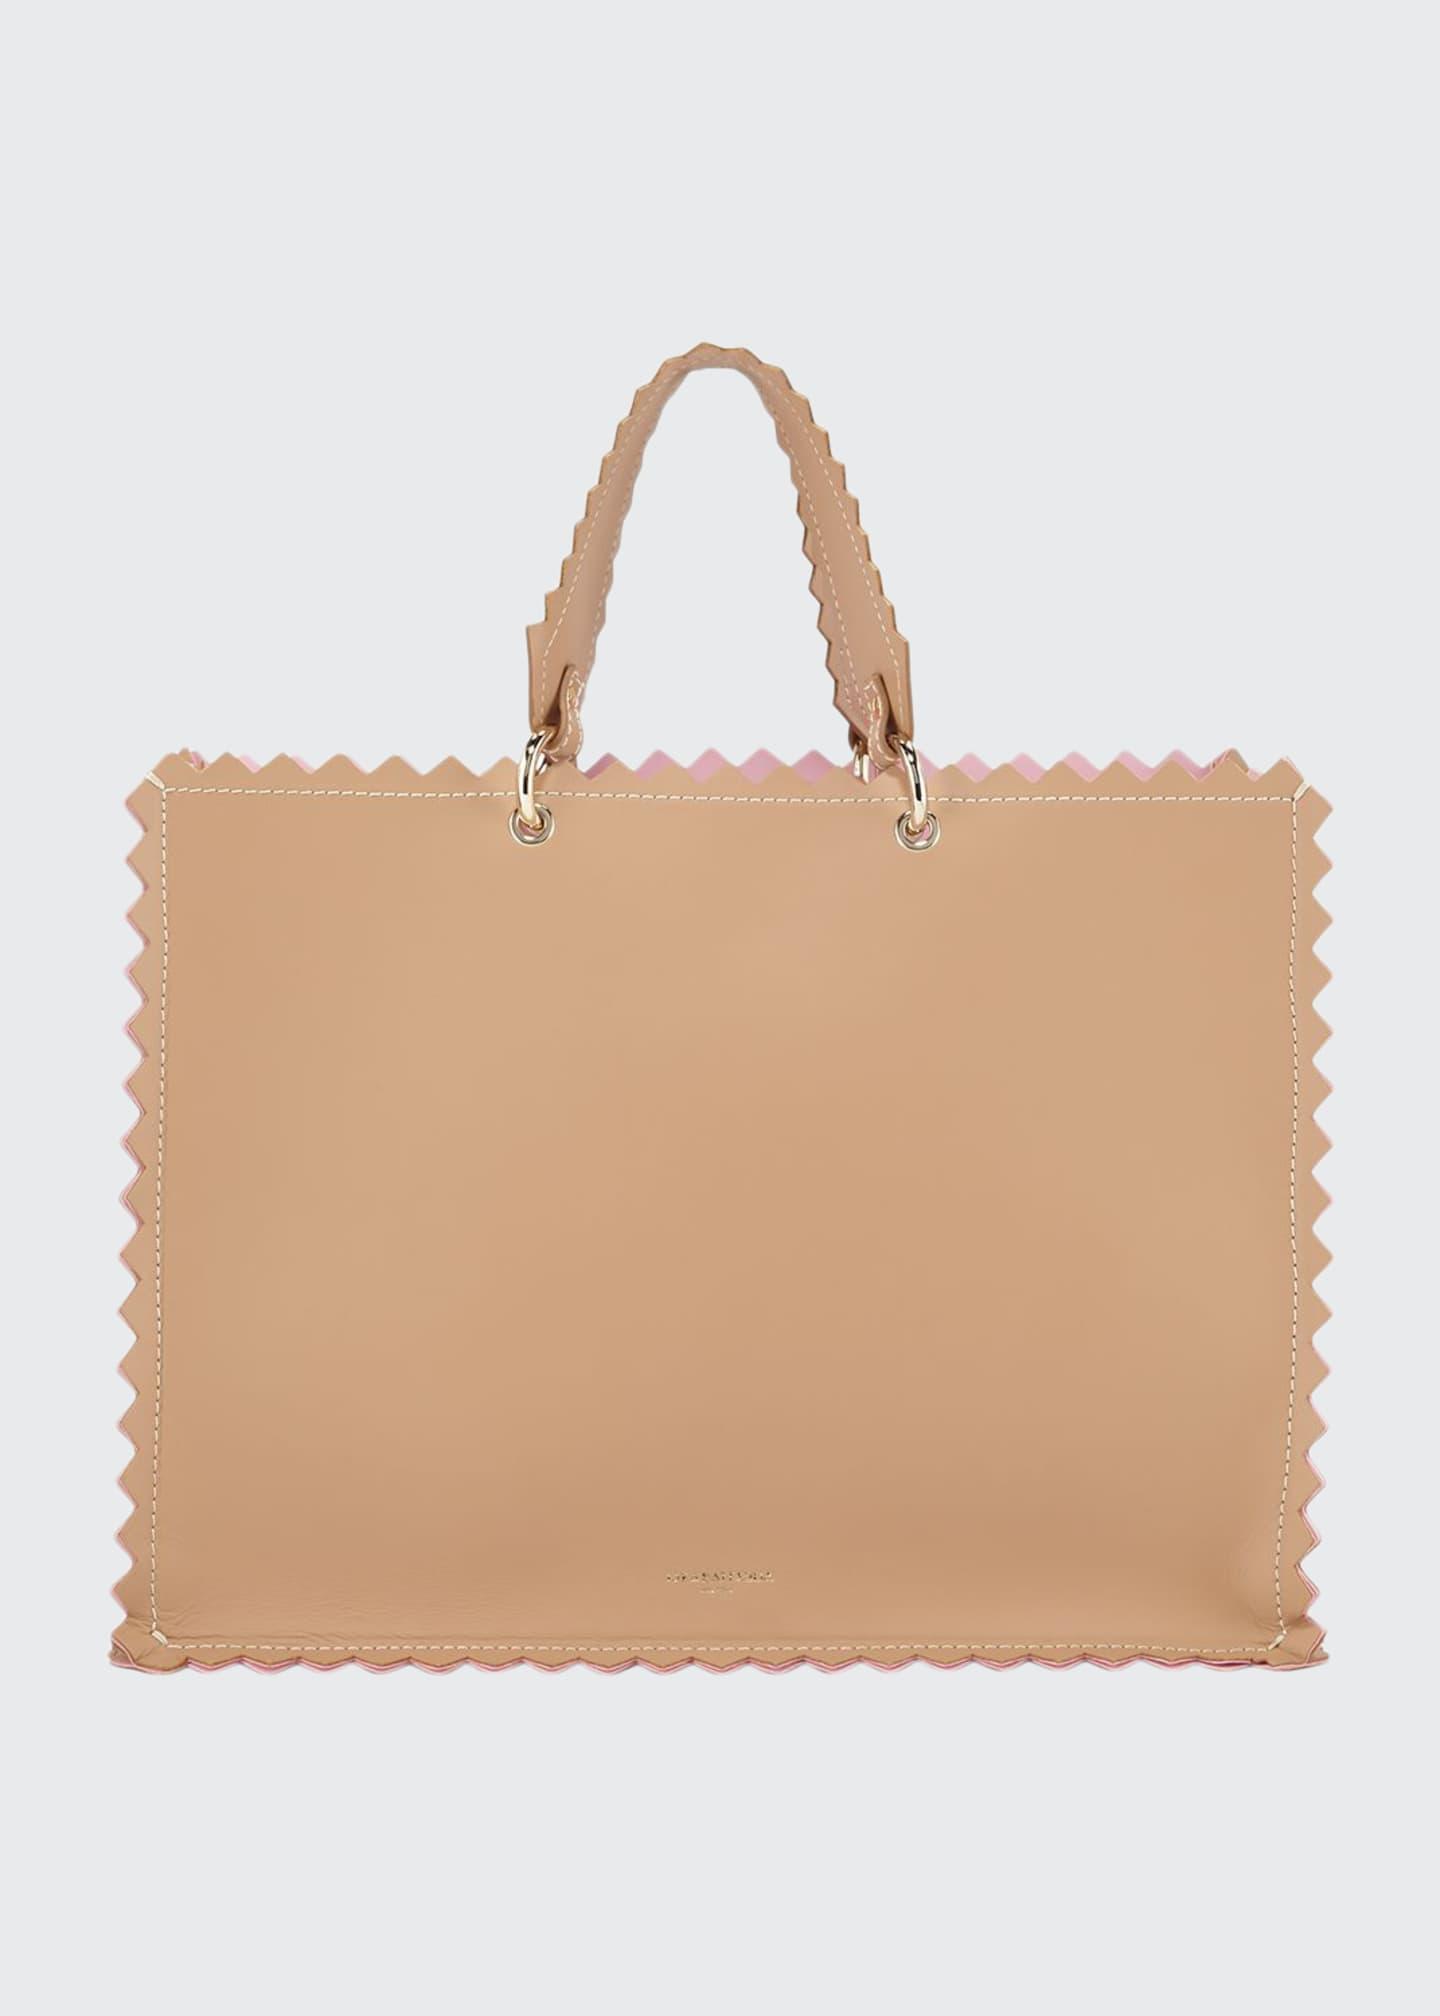 Sara Battaglia Helena Leather Metallic Tote Bag